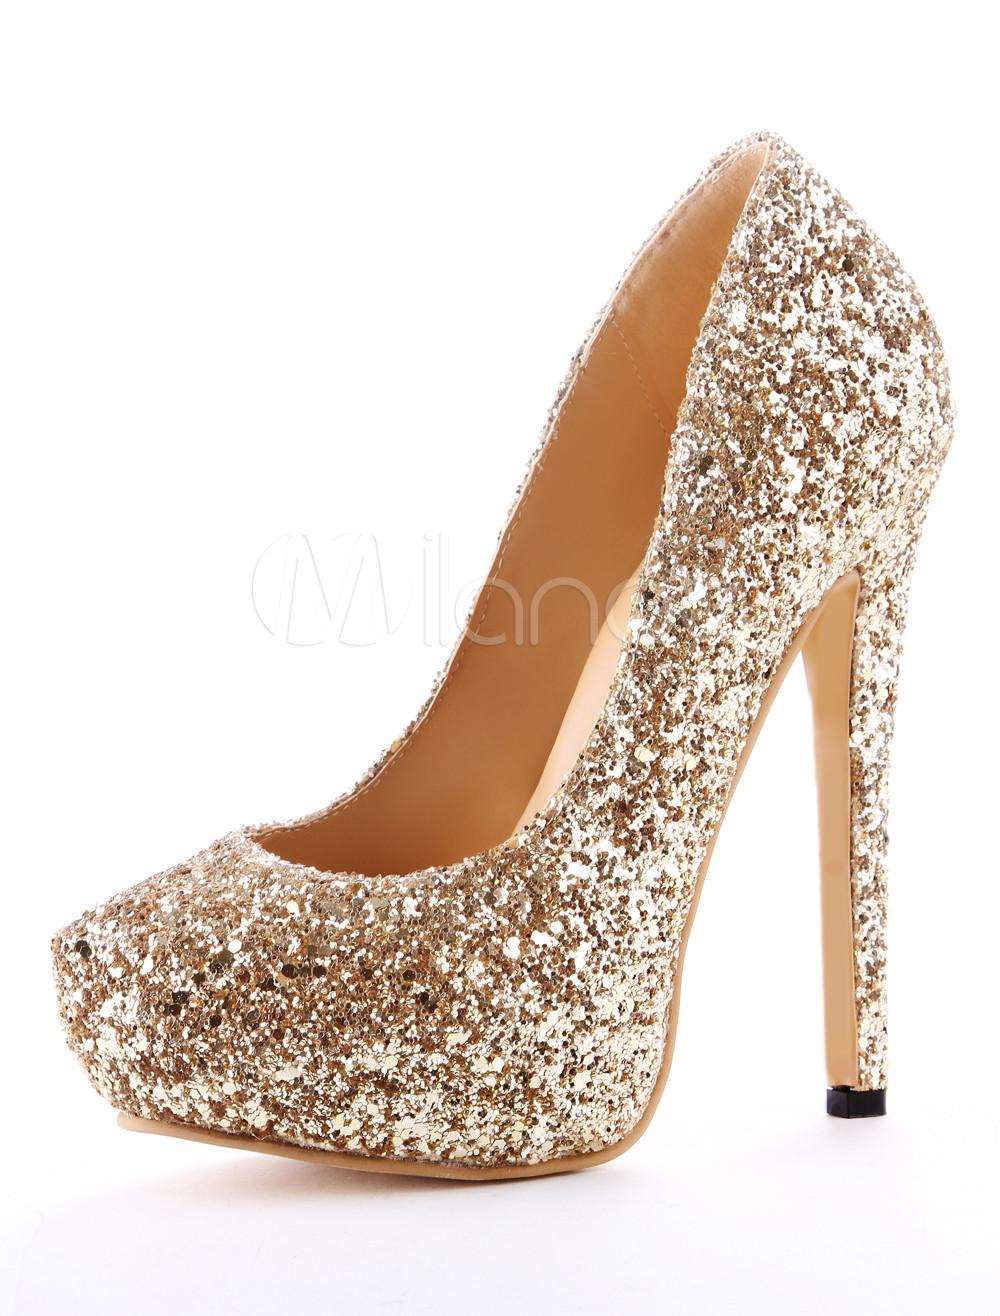 Zapatos de puntera puntiaguada de tacón de stiletto con pala de charol con perlaselegantes para boda mRlAFk2Uk2